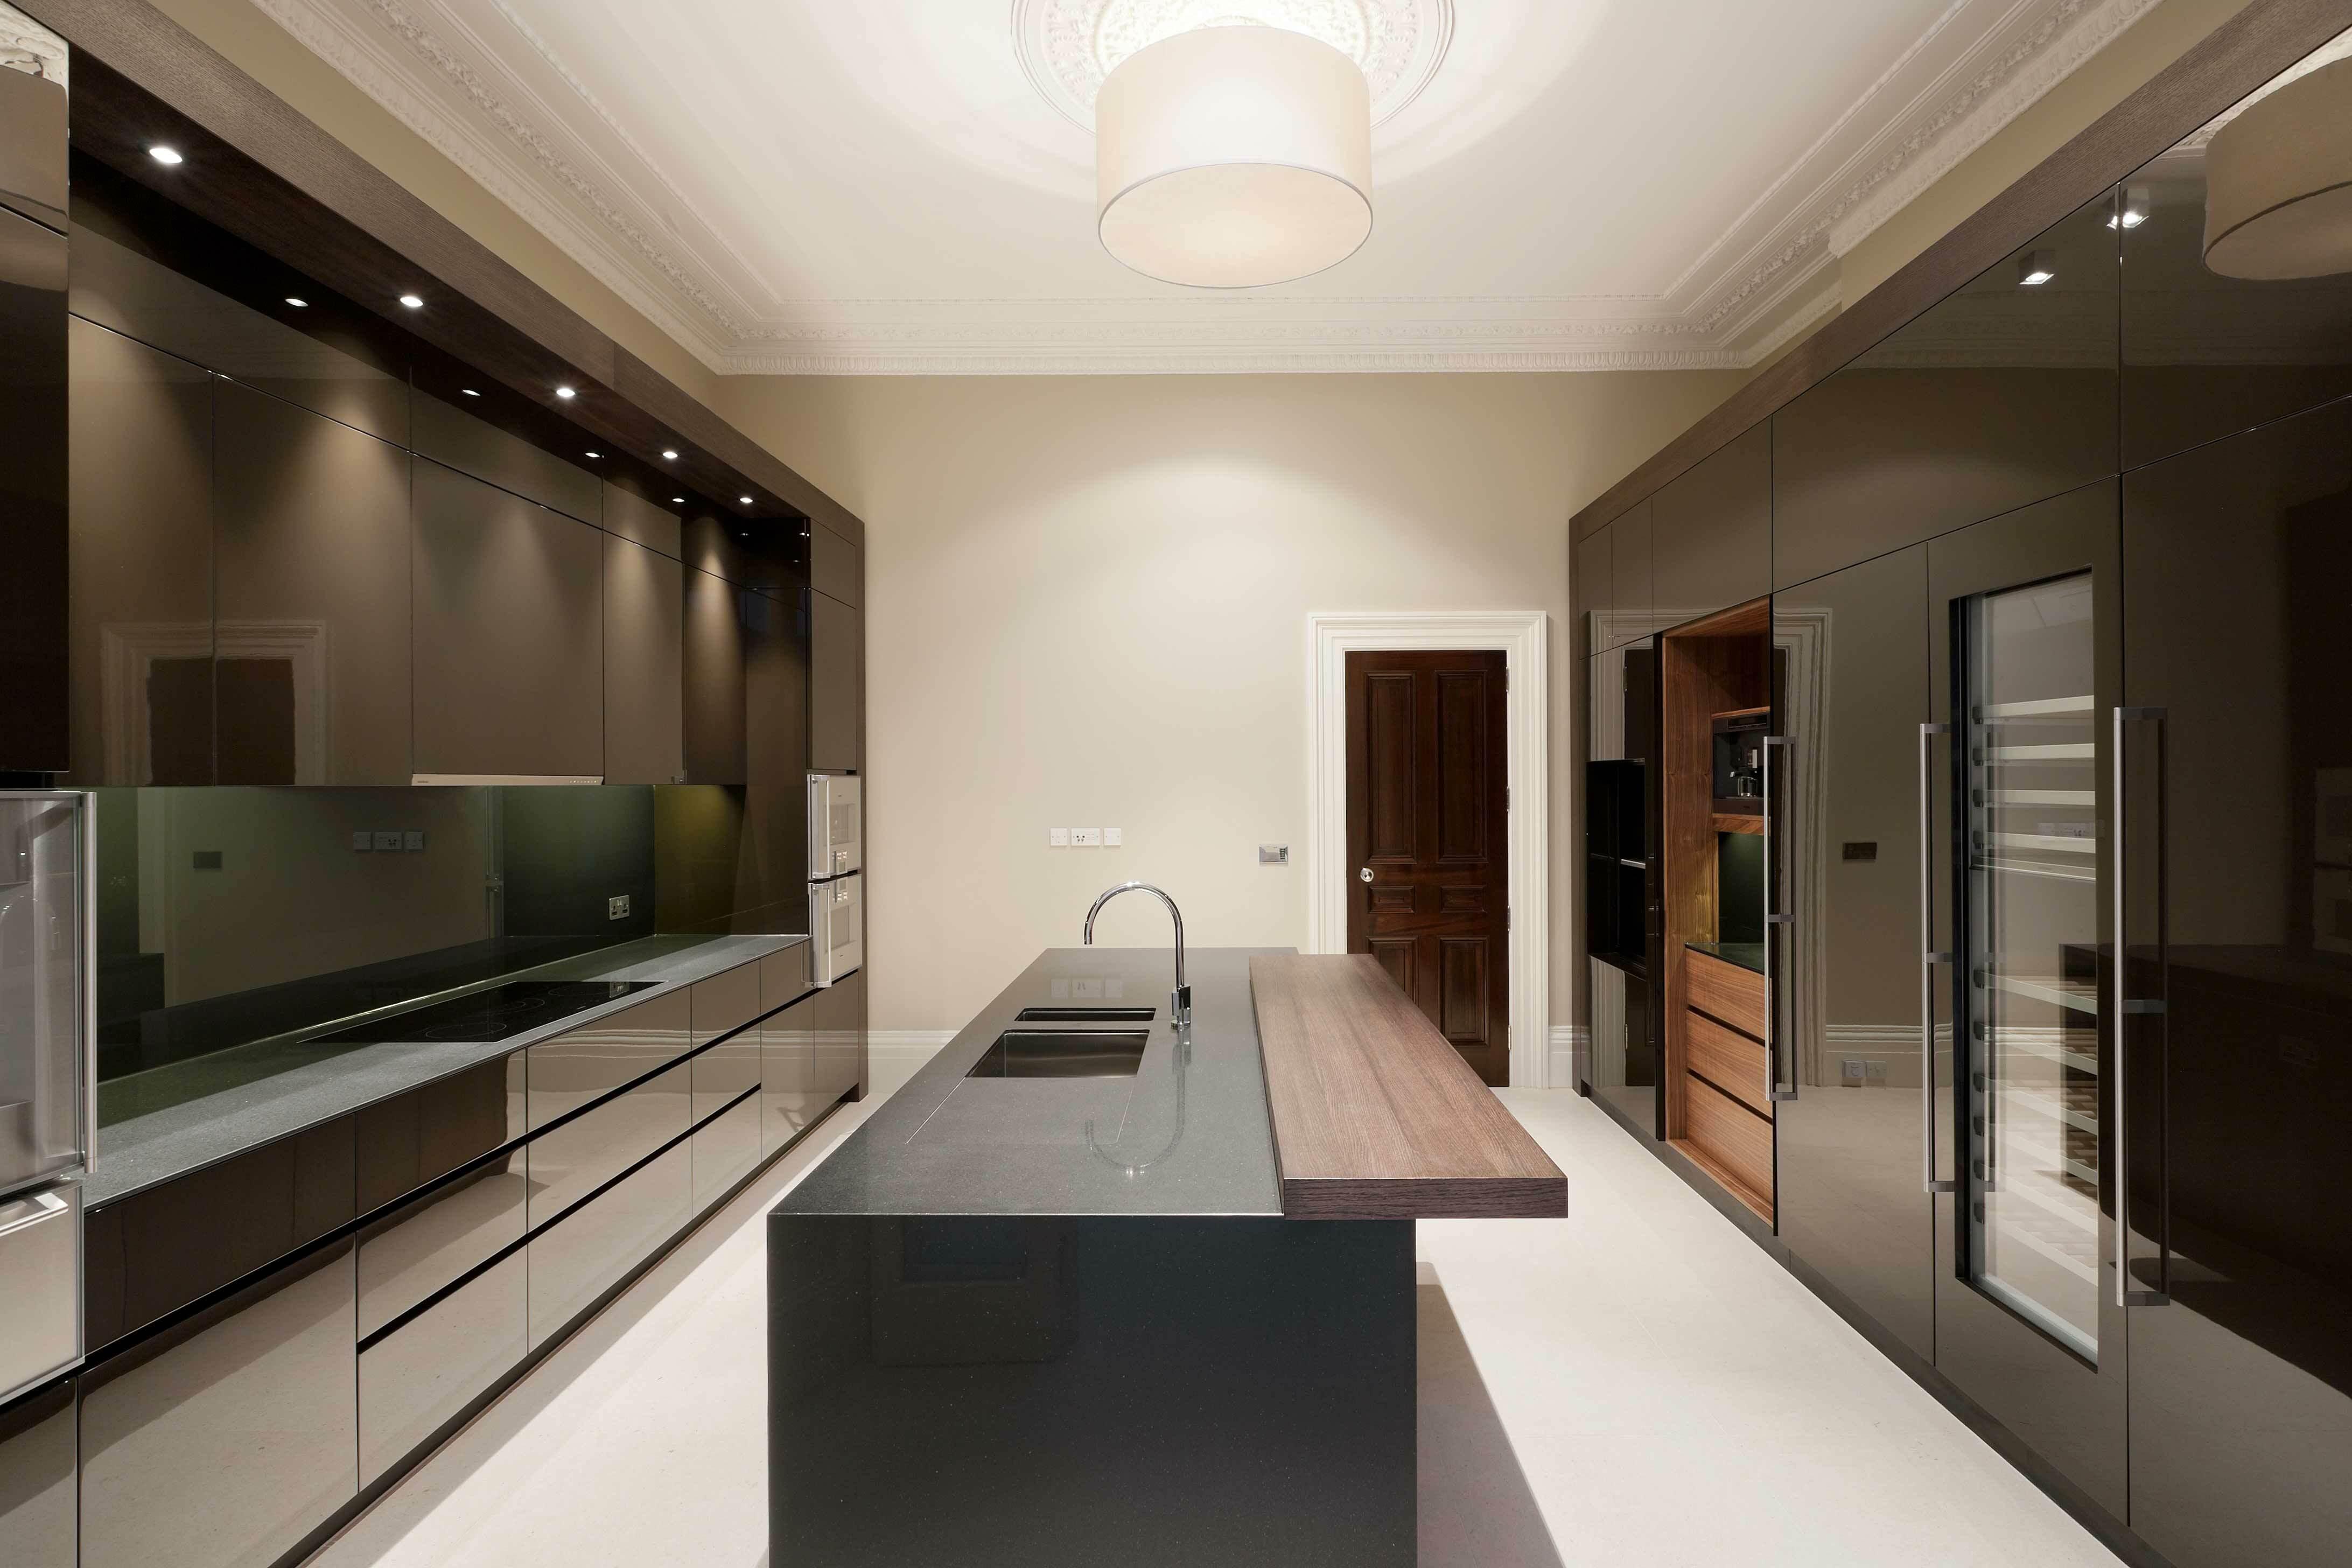 Kitchens_10.jpg